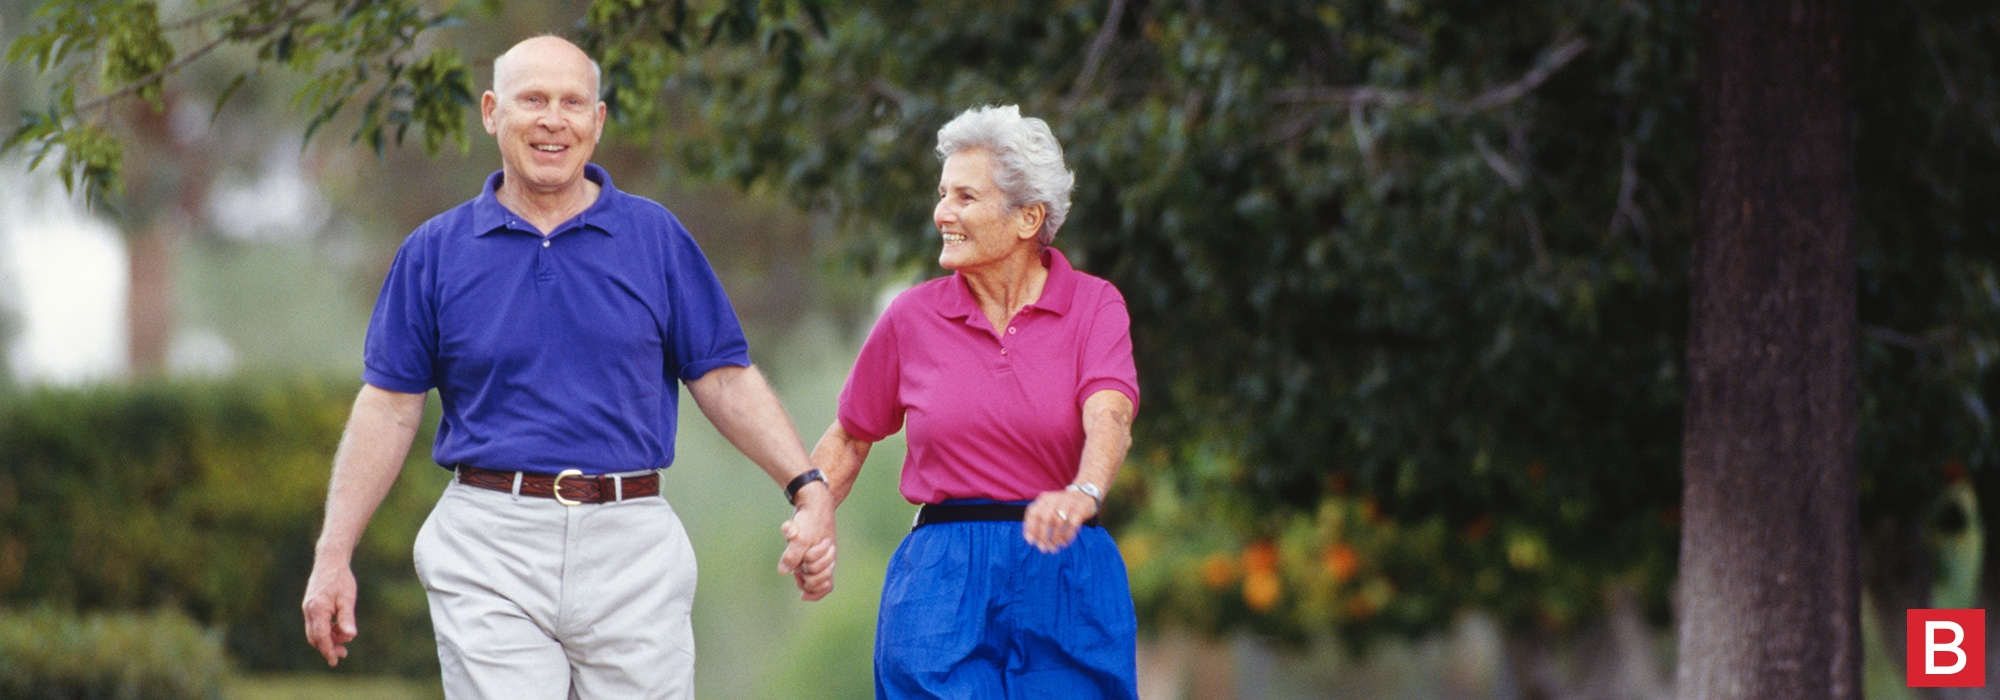 12-benefits-of-walking-2000x700.jpg